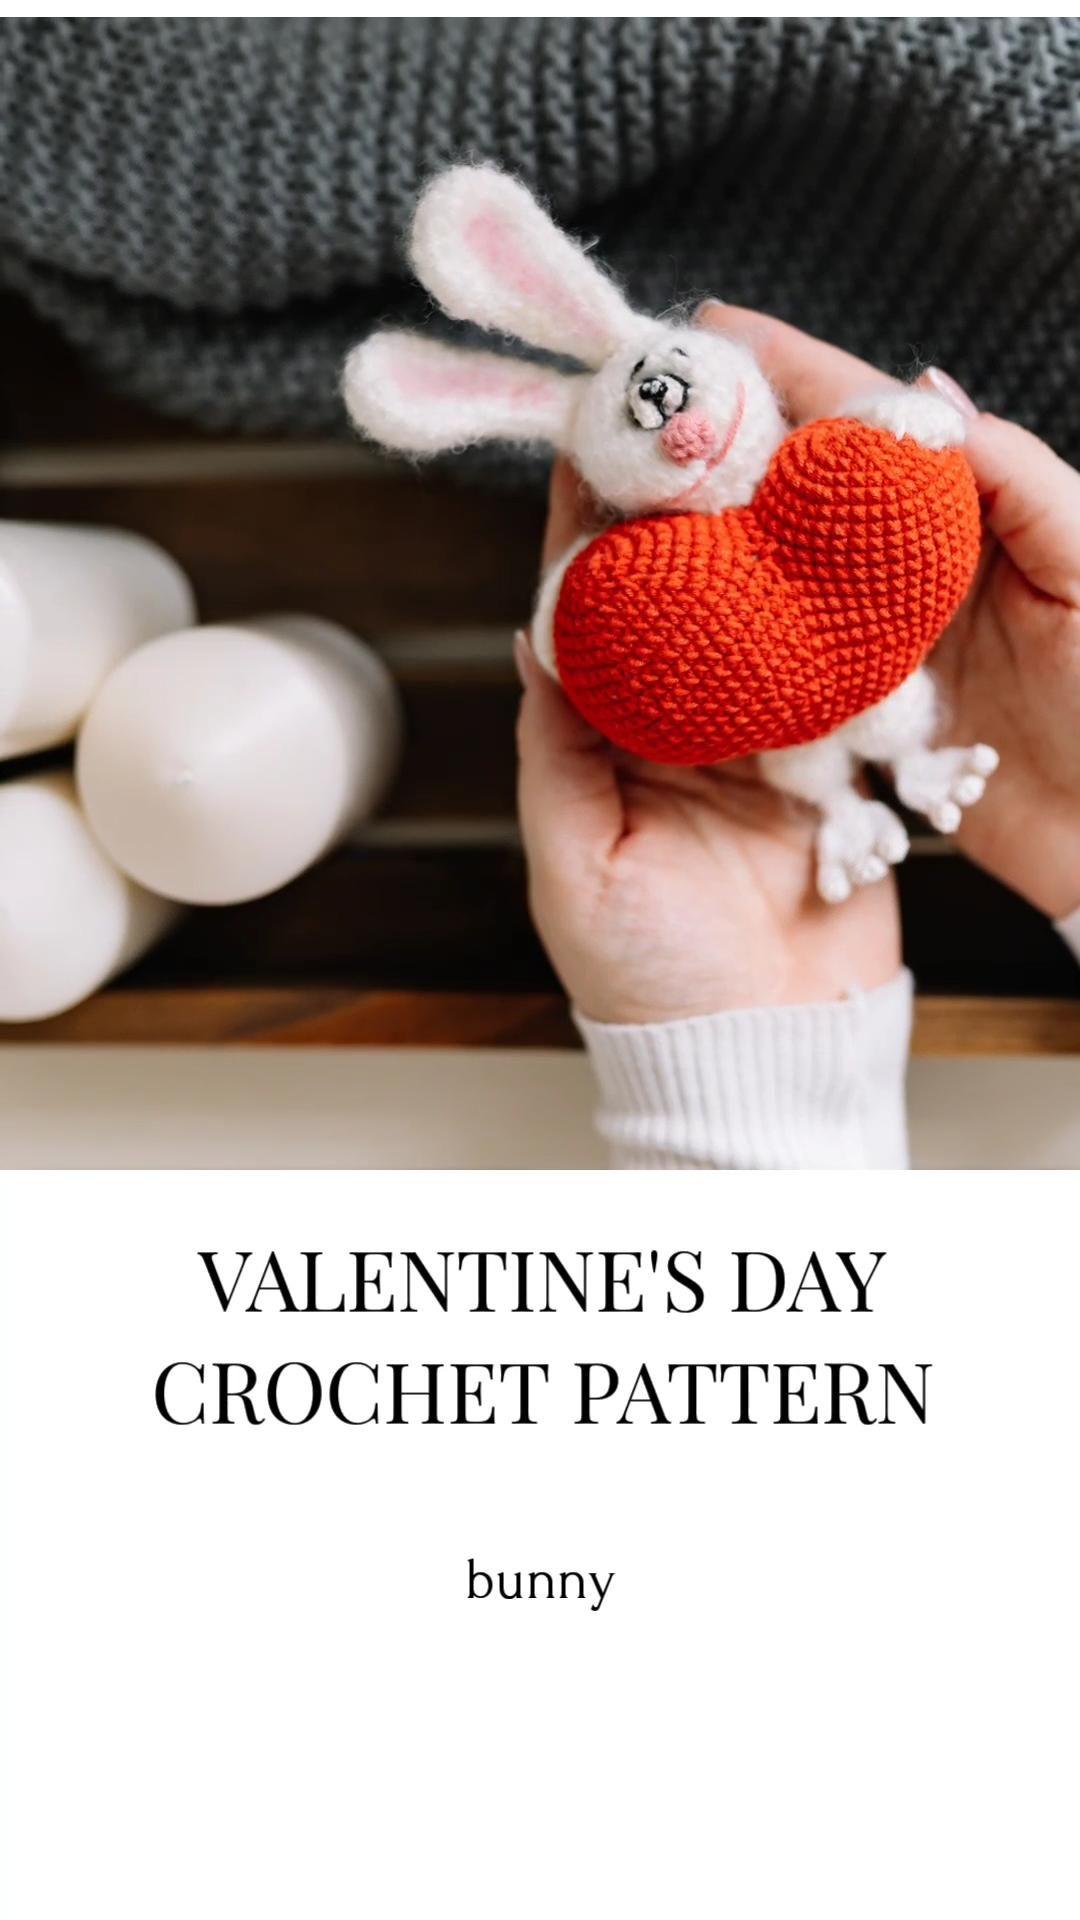 Valentines day crochet pattern, amigurumi pattern,